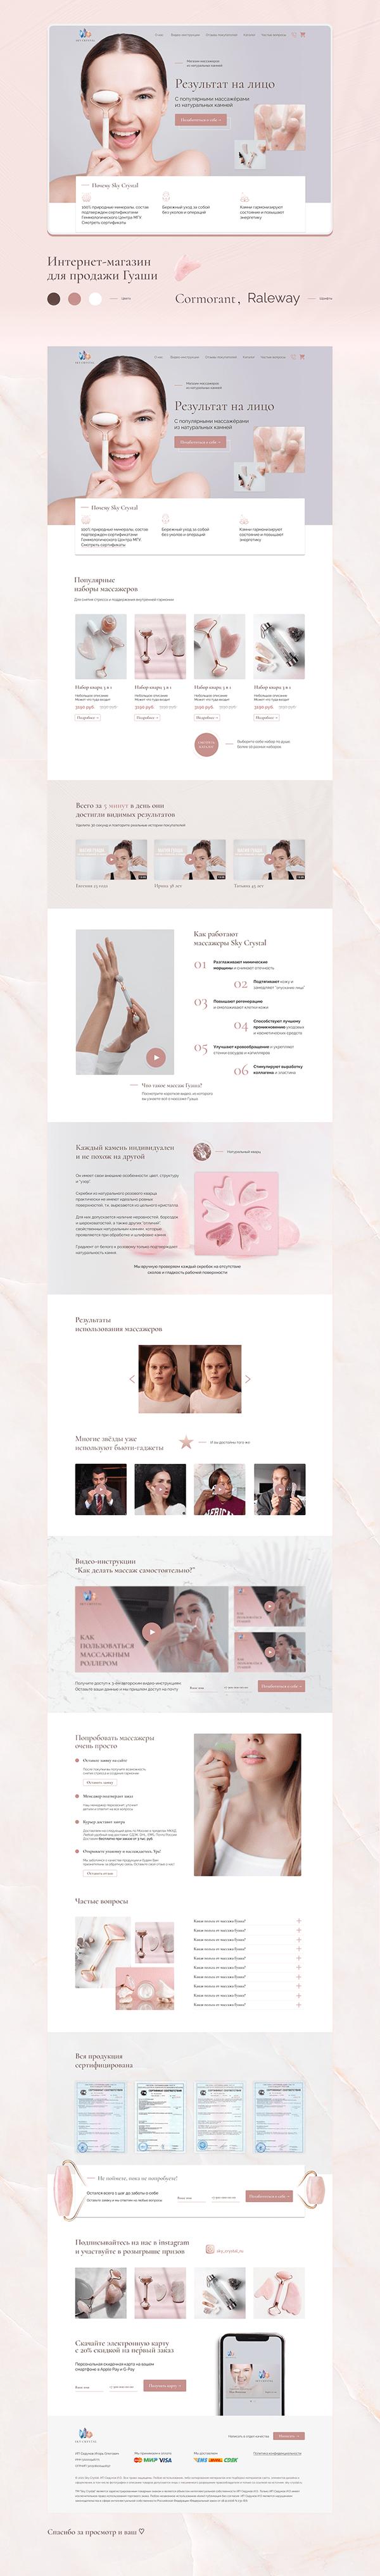 Landing page для продажи косметики (гуаши, роллеры)